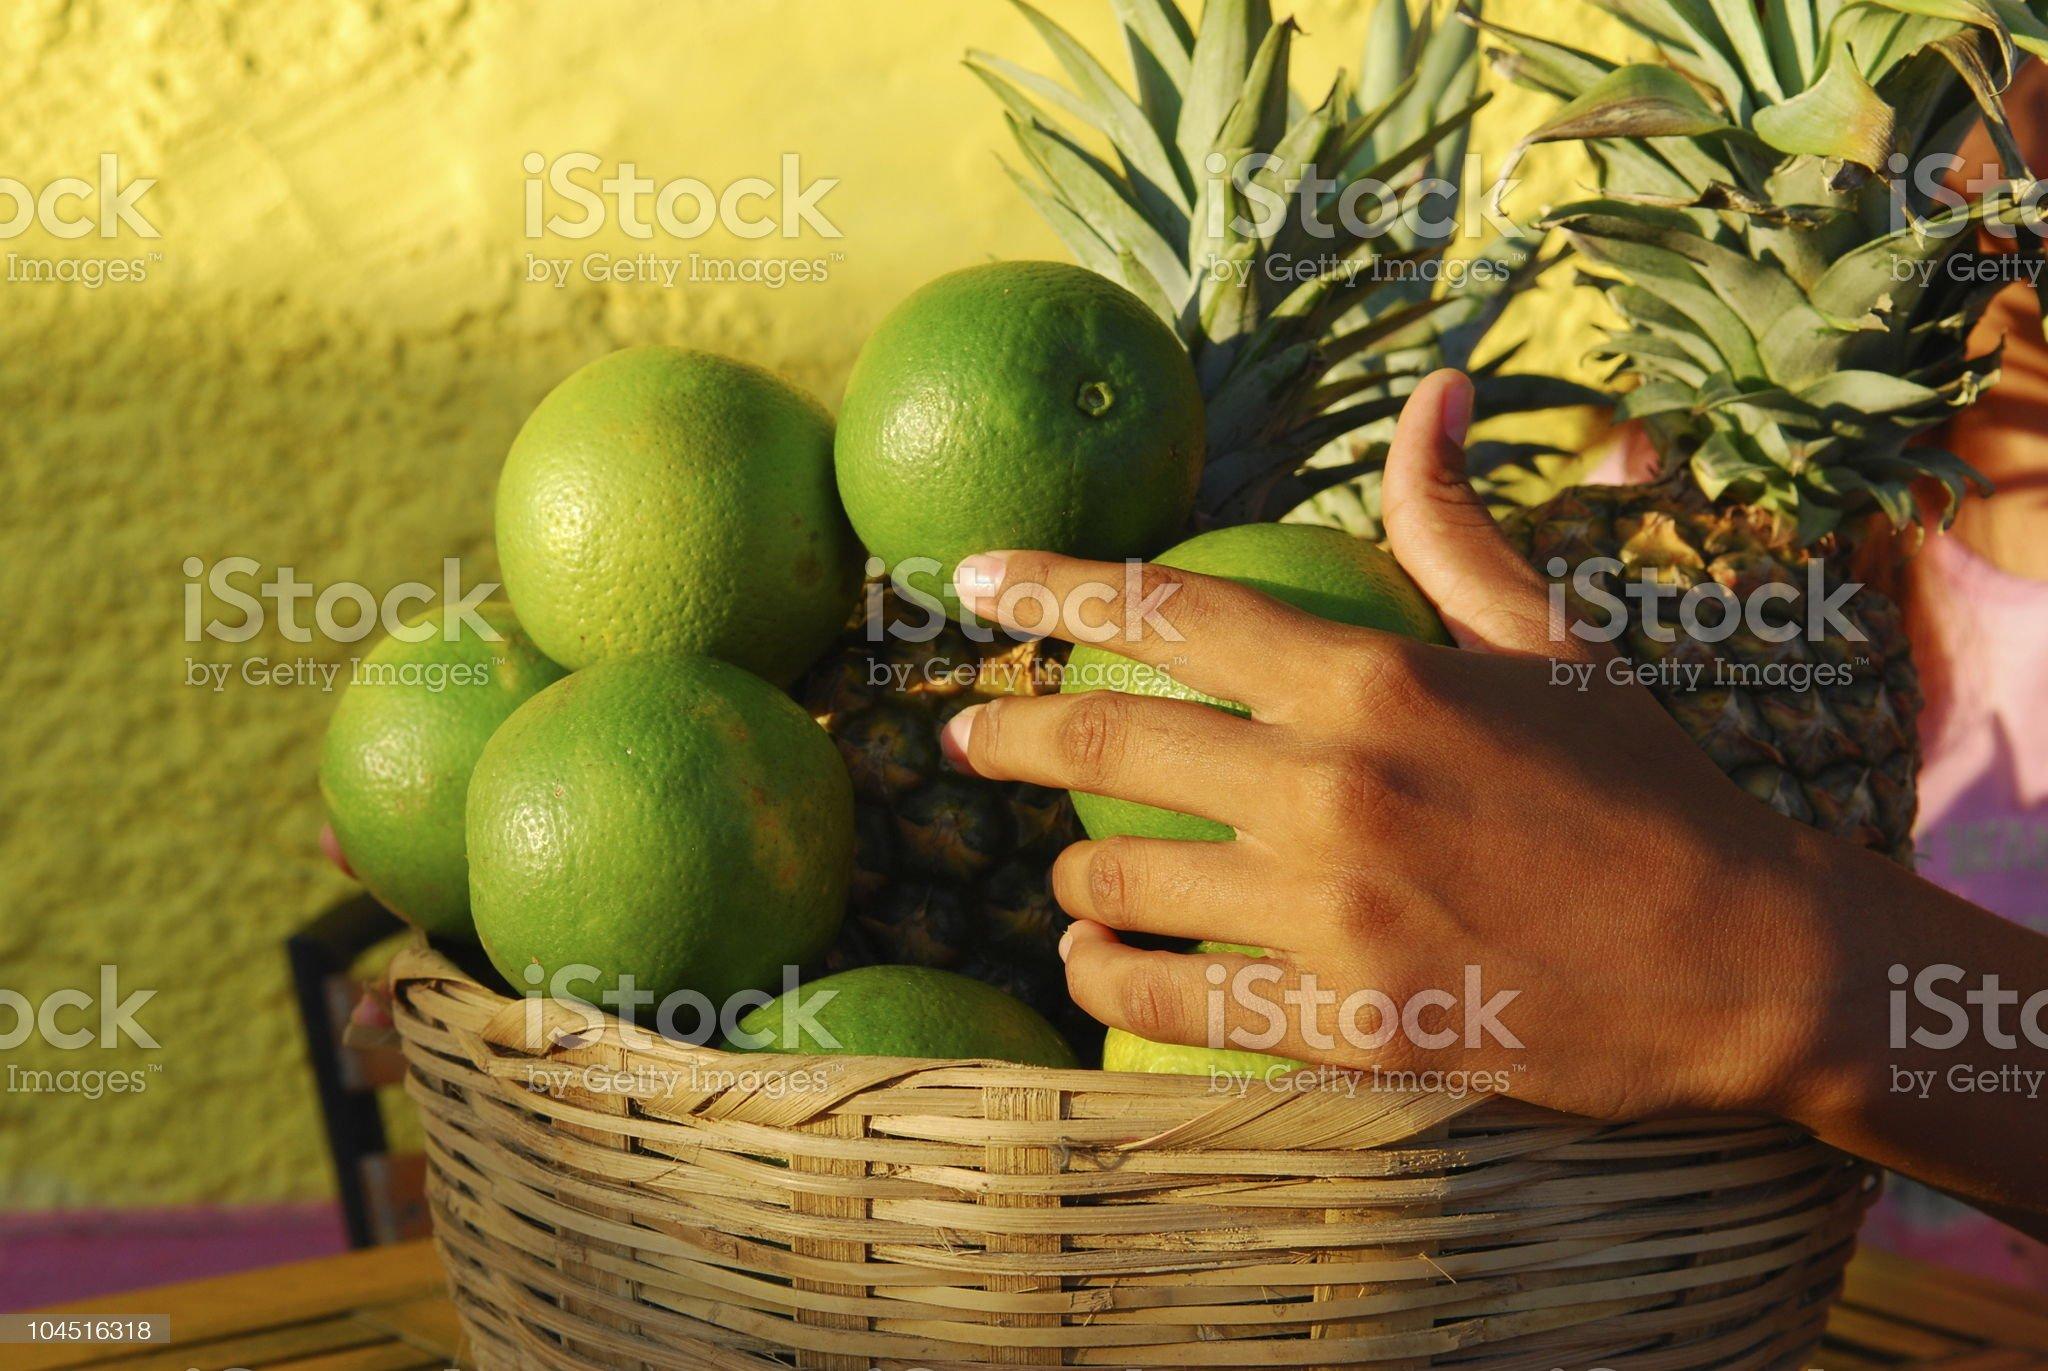 Hand on tropical fruit basket - Granada, Nicaragua royalty-free stock photo